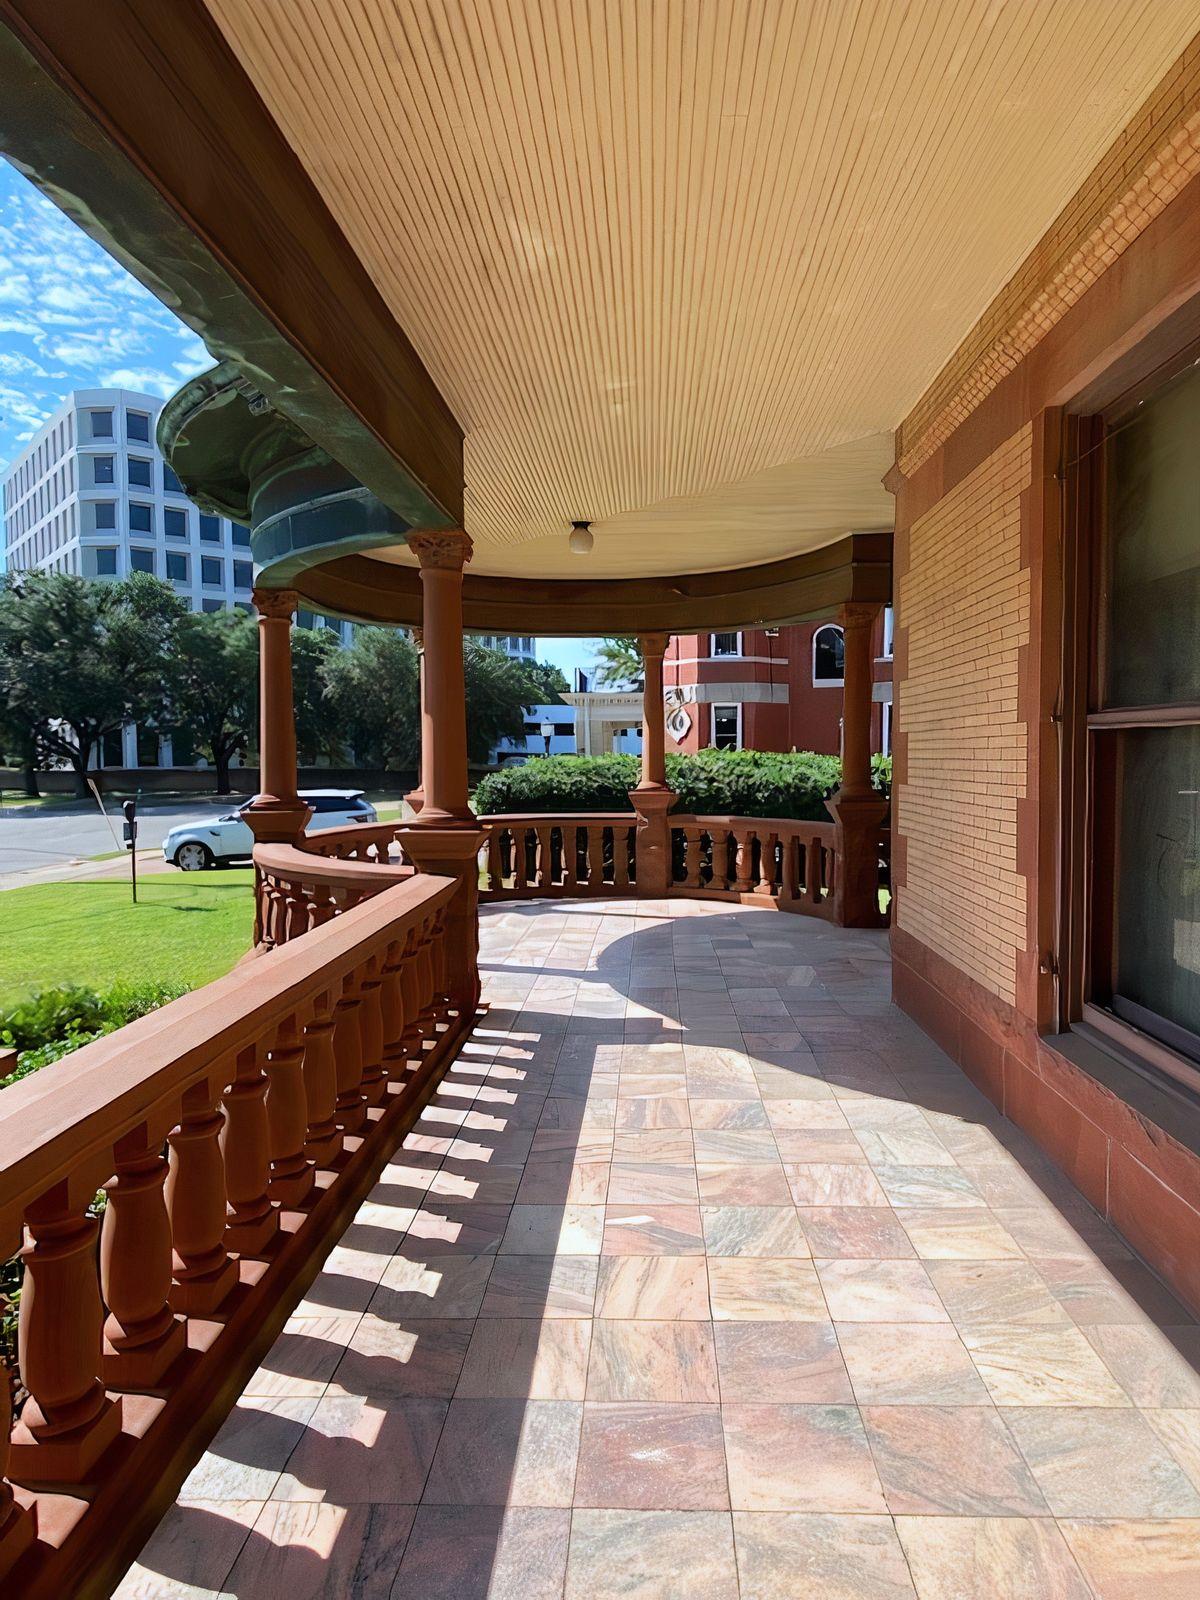 McFarland Historical Home Photo Video Shoot Location Dallas 38.jpg